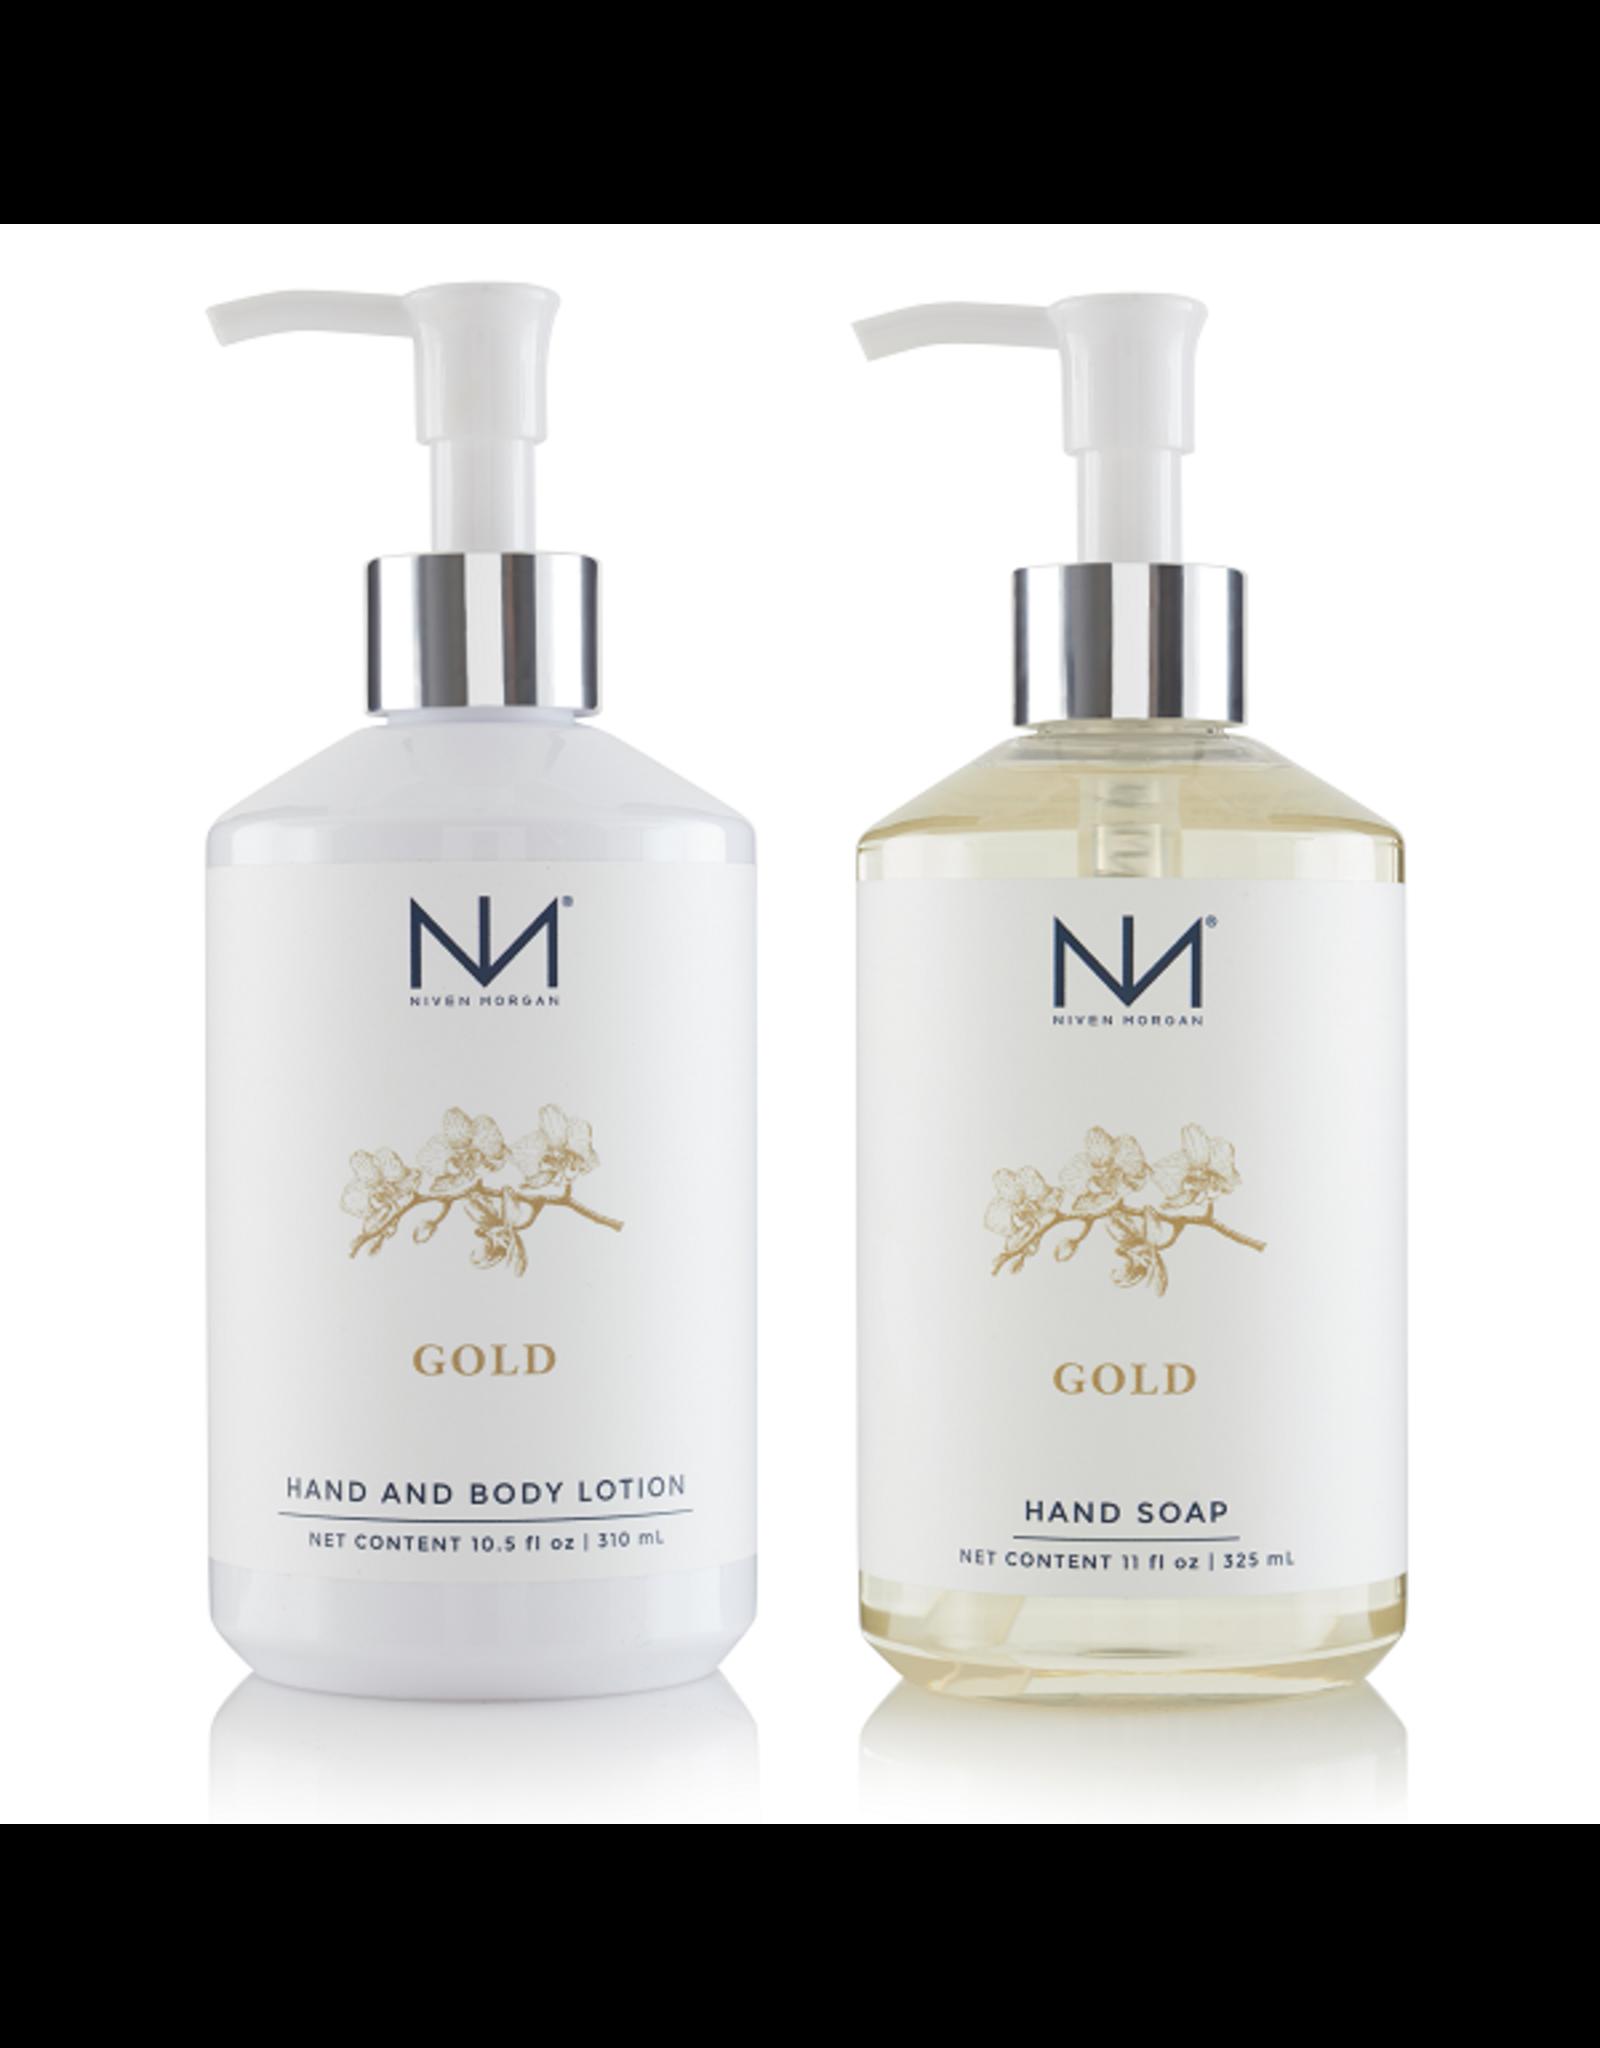 Niven Morgan Niven Morgan Gold Hand Set Lotion & Soap